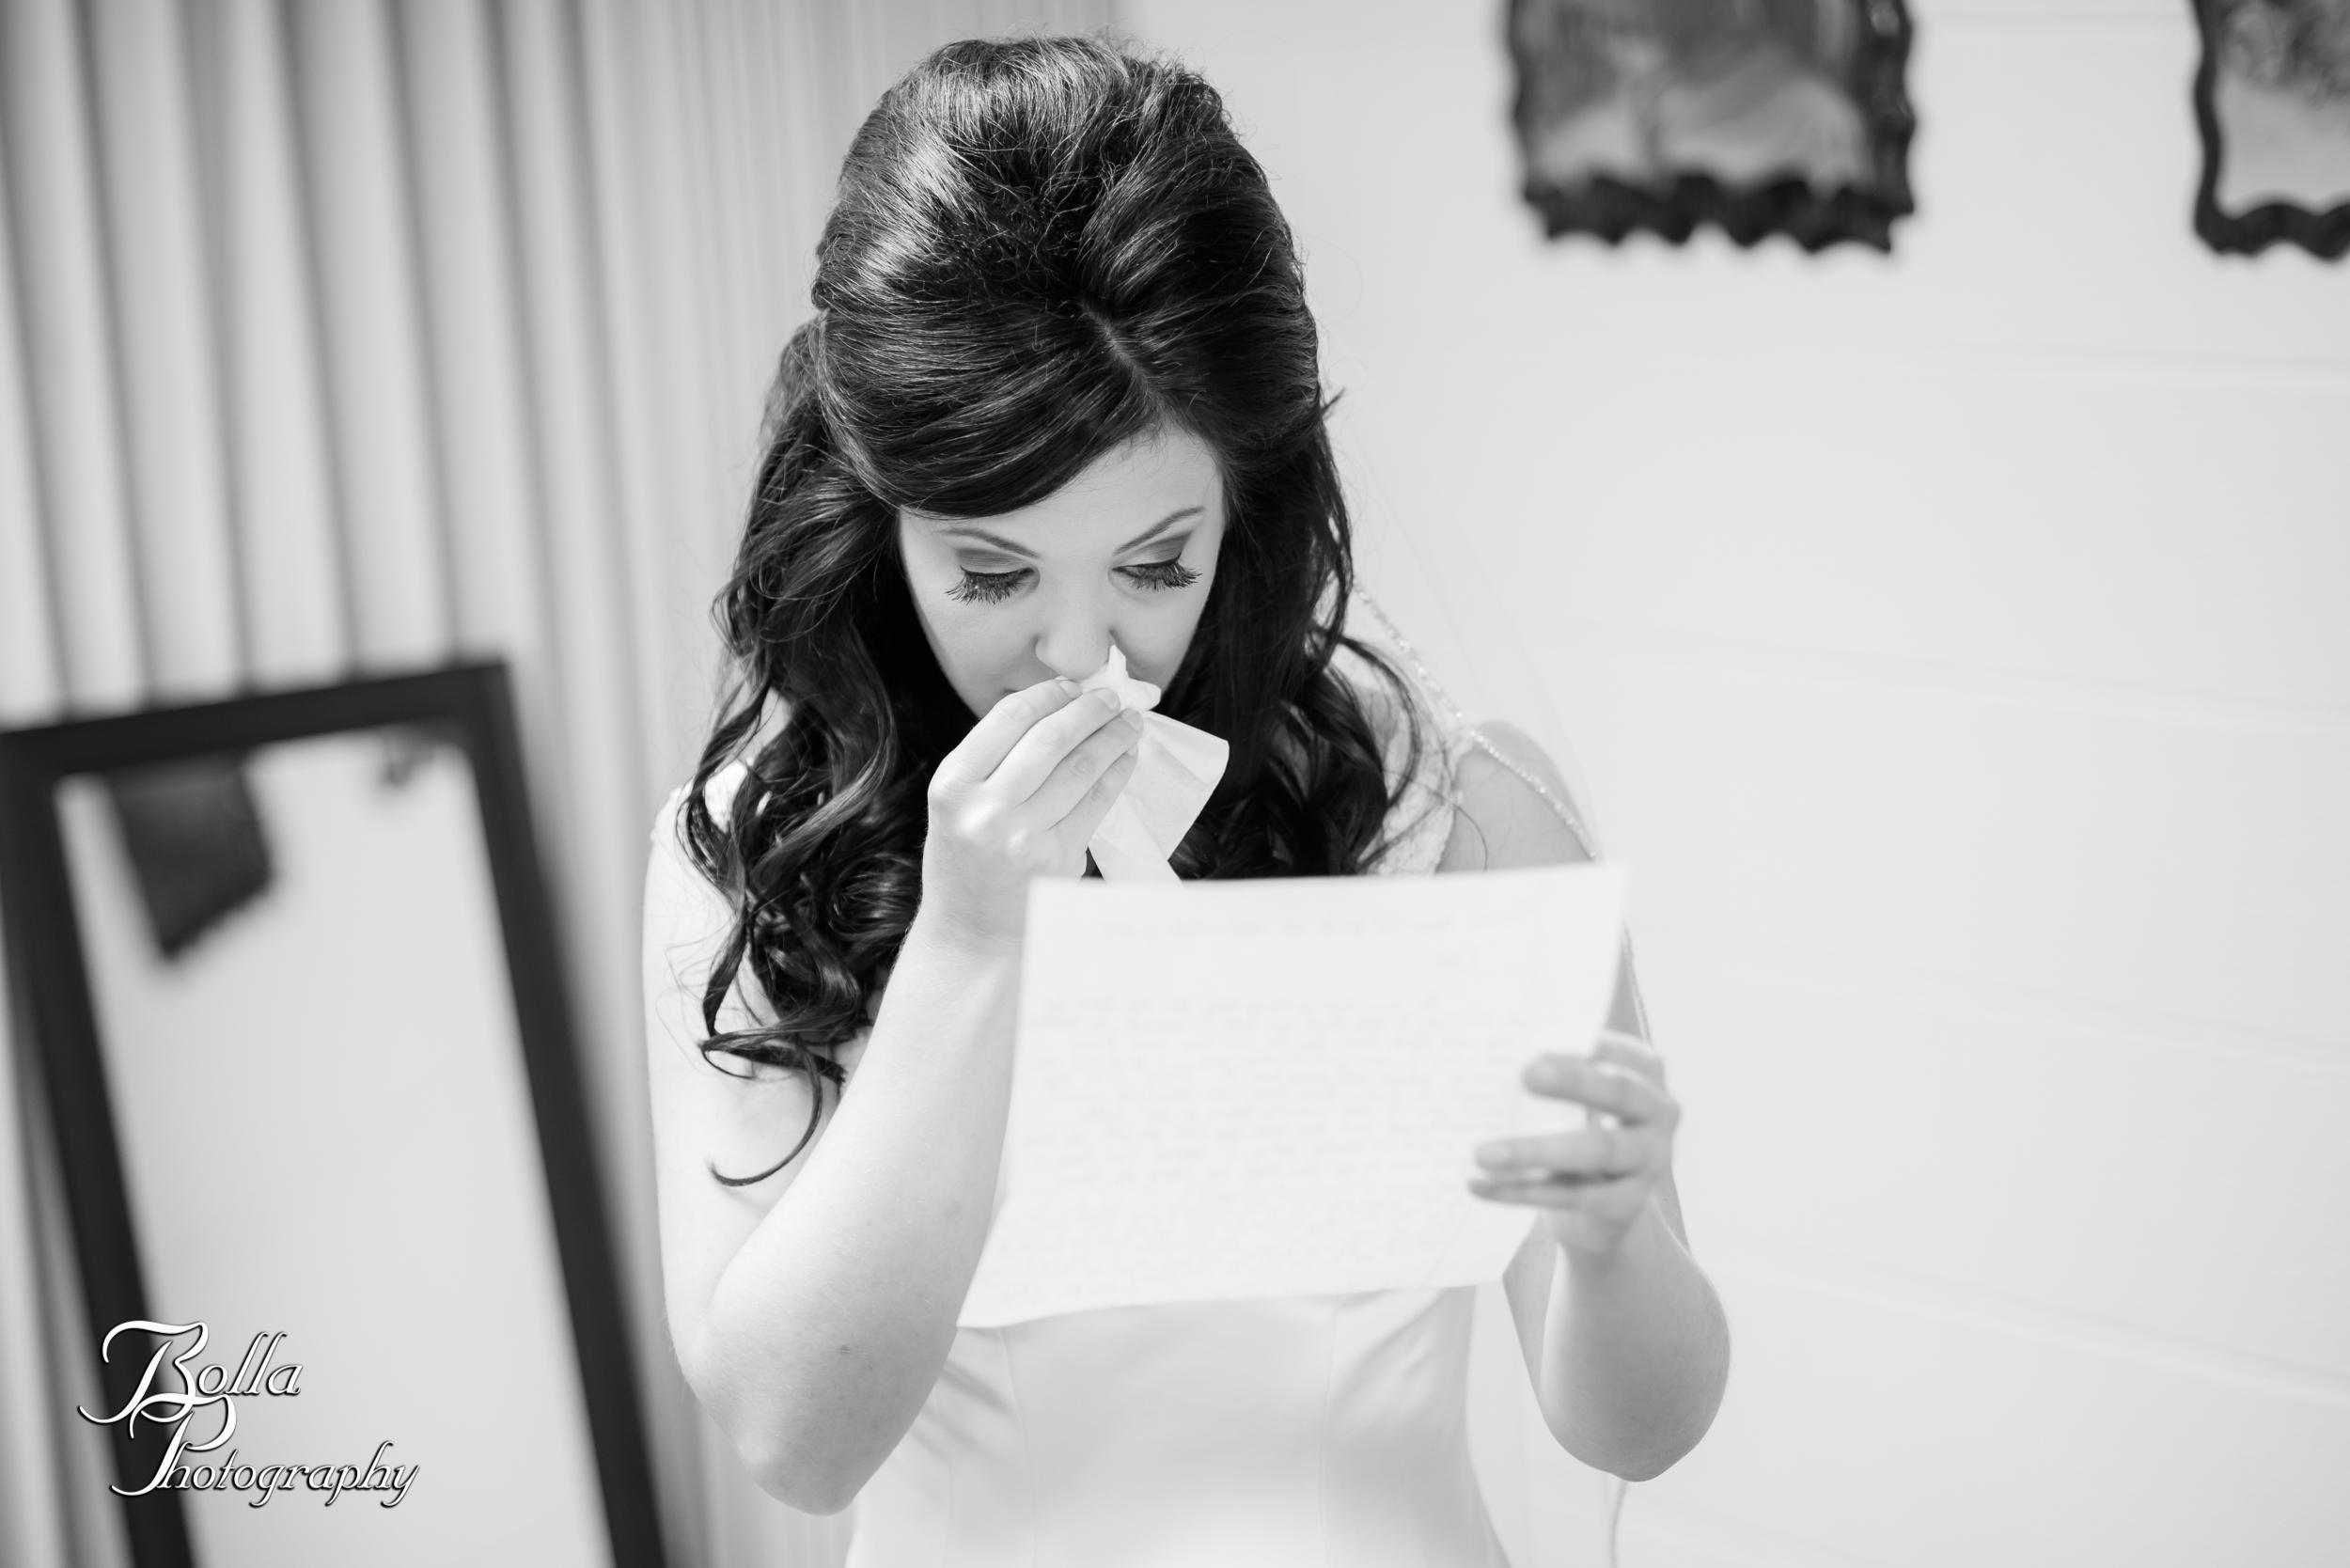 Bolla_photography_edwardsville_wedding_photographer_st_louis_weddings_Reilmann-0060.jpg